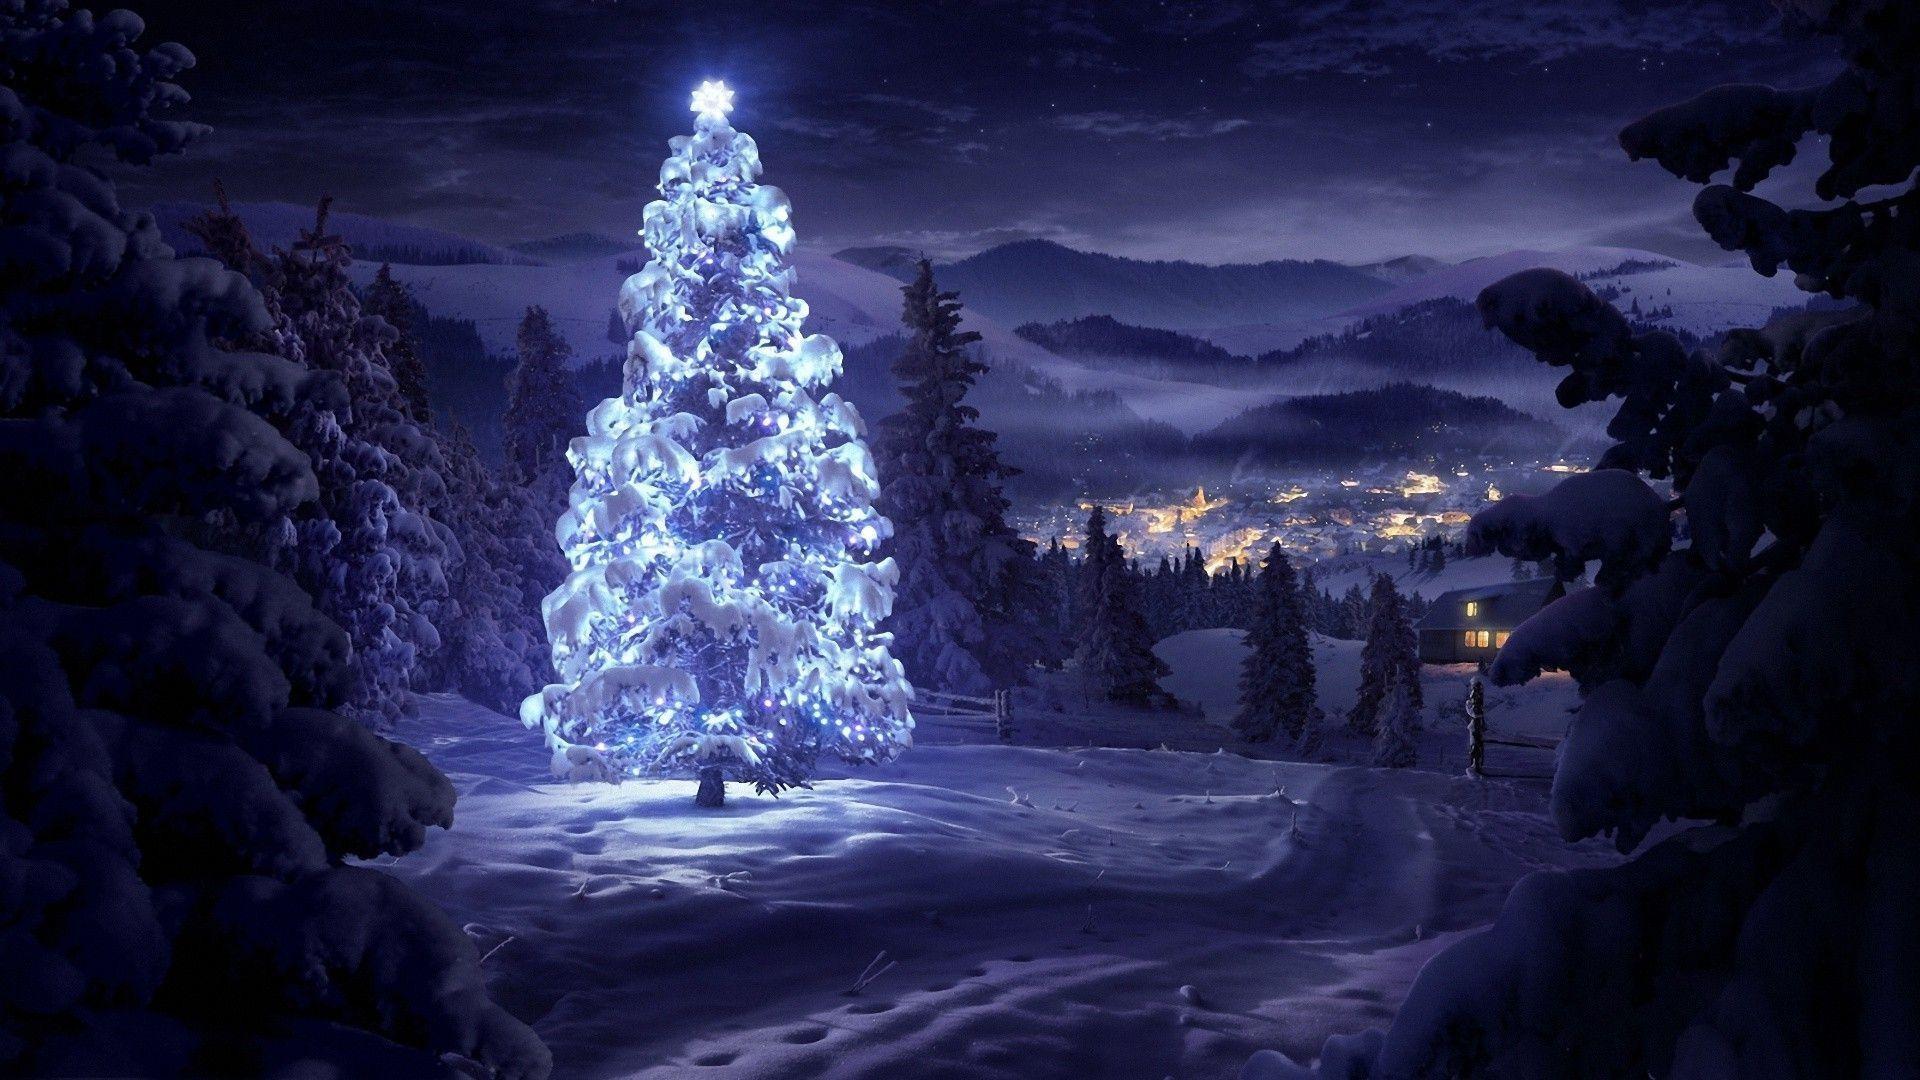 Merry Christmas Snow Fall Night Wallpaper Pics